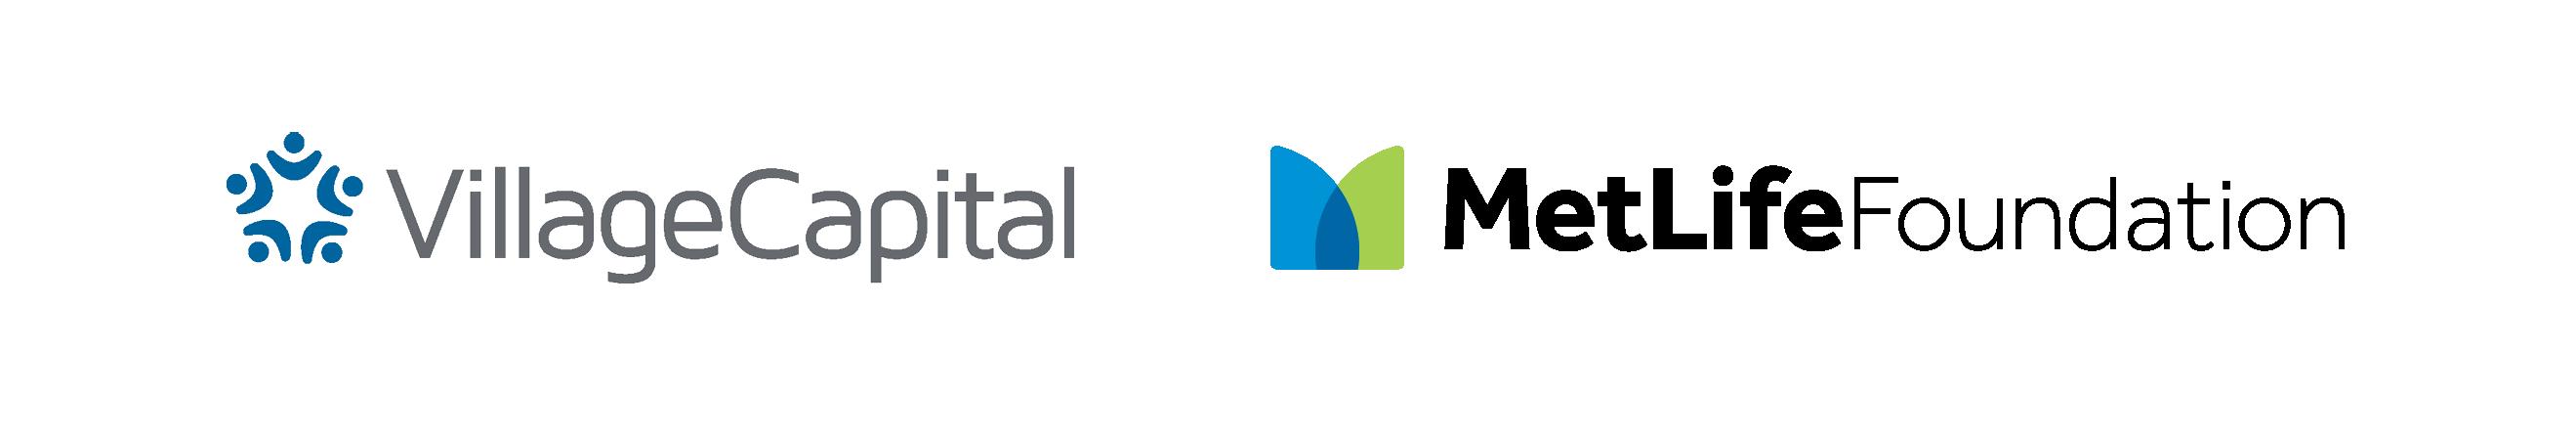 Village Capital - MetLife Foundation